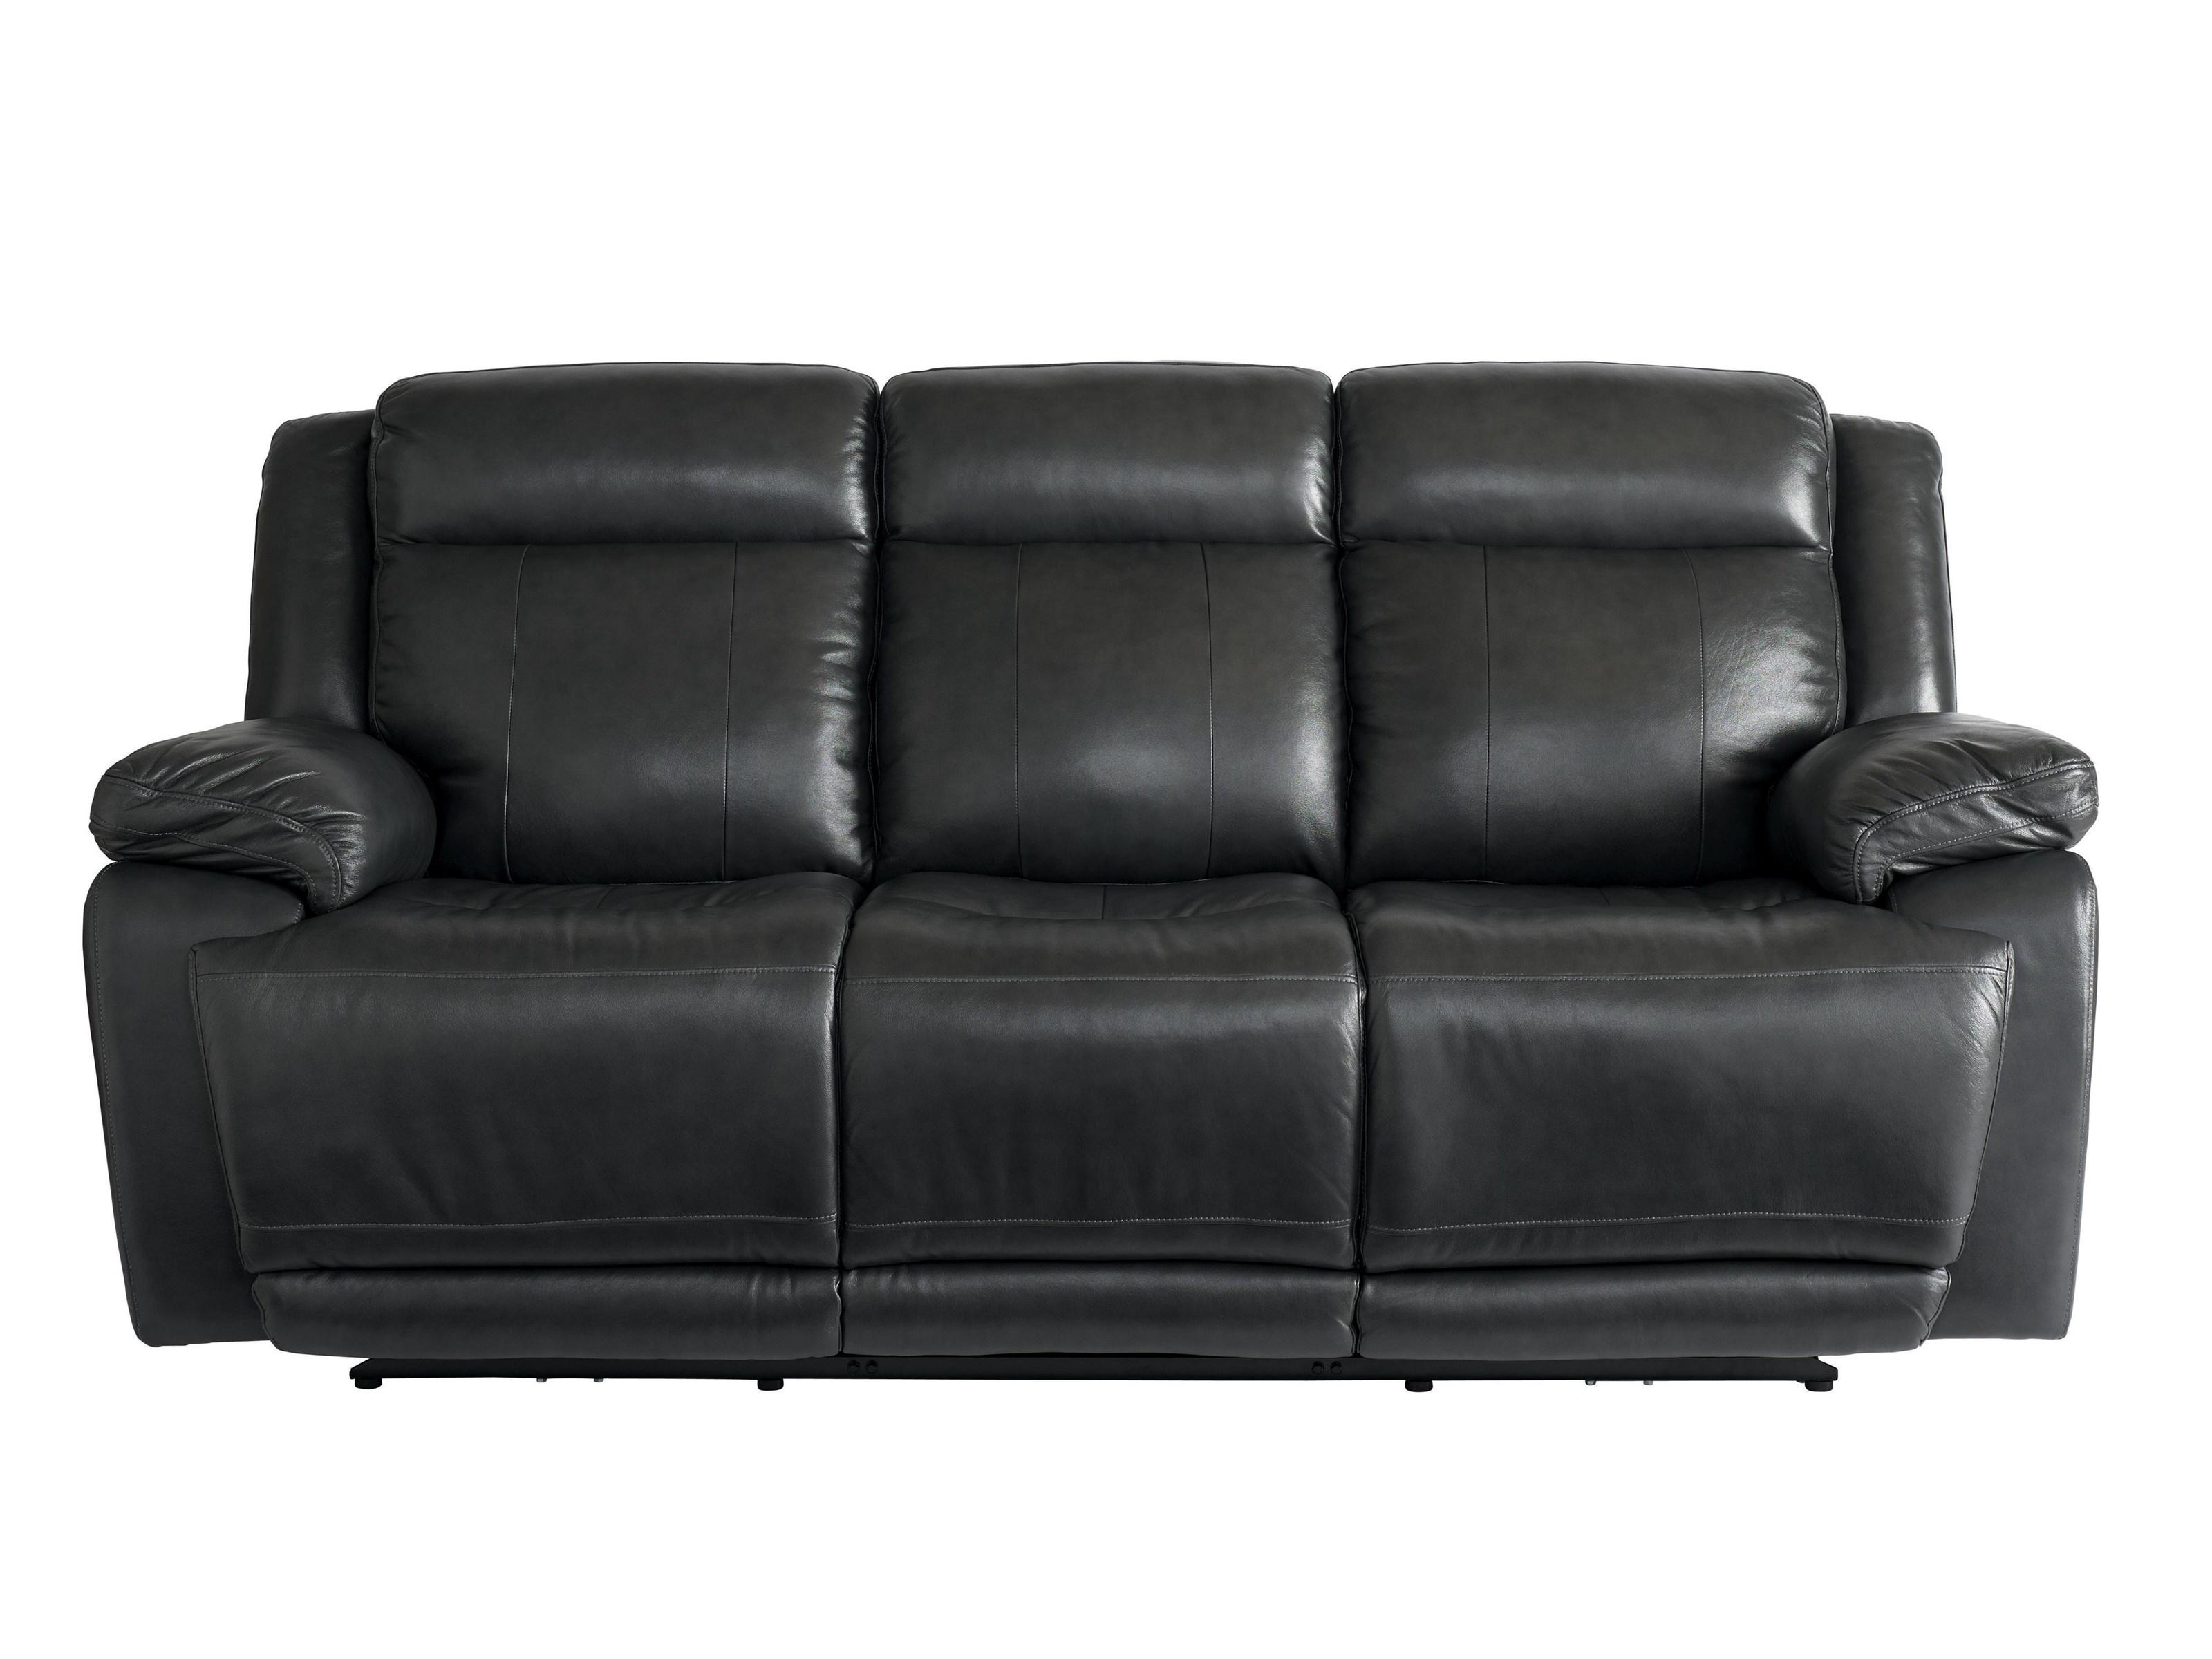 Bassett Club Level Evo Graphite Leather Power Reclining Sofa with